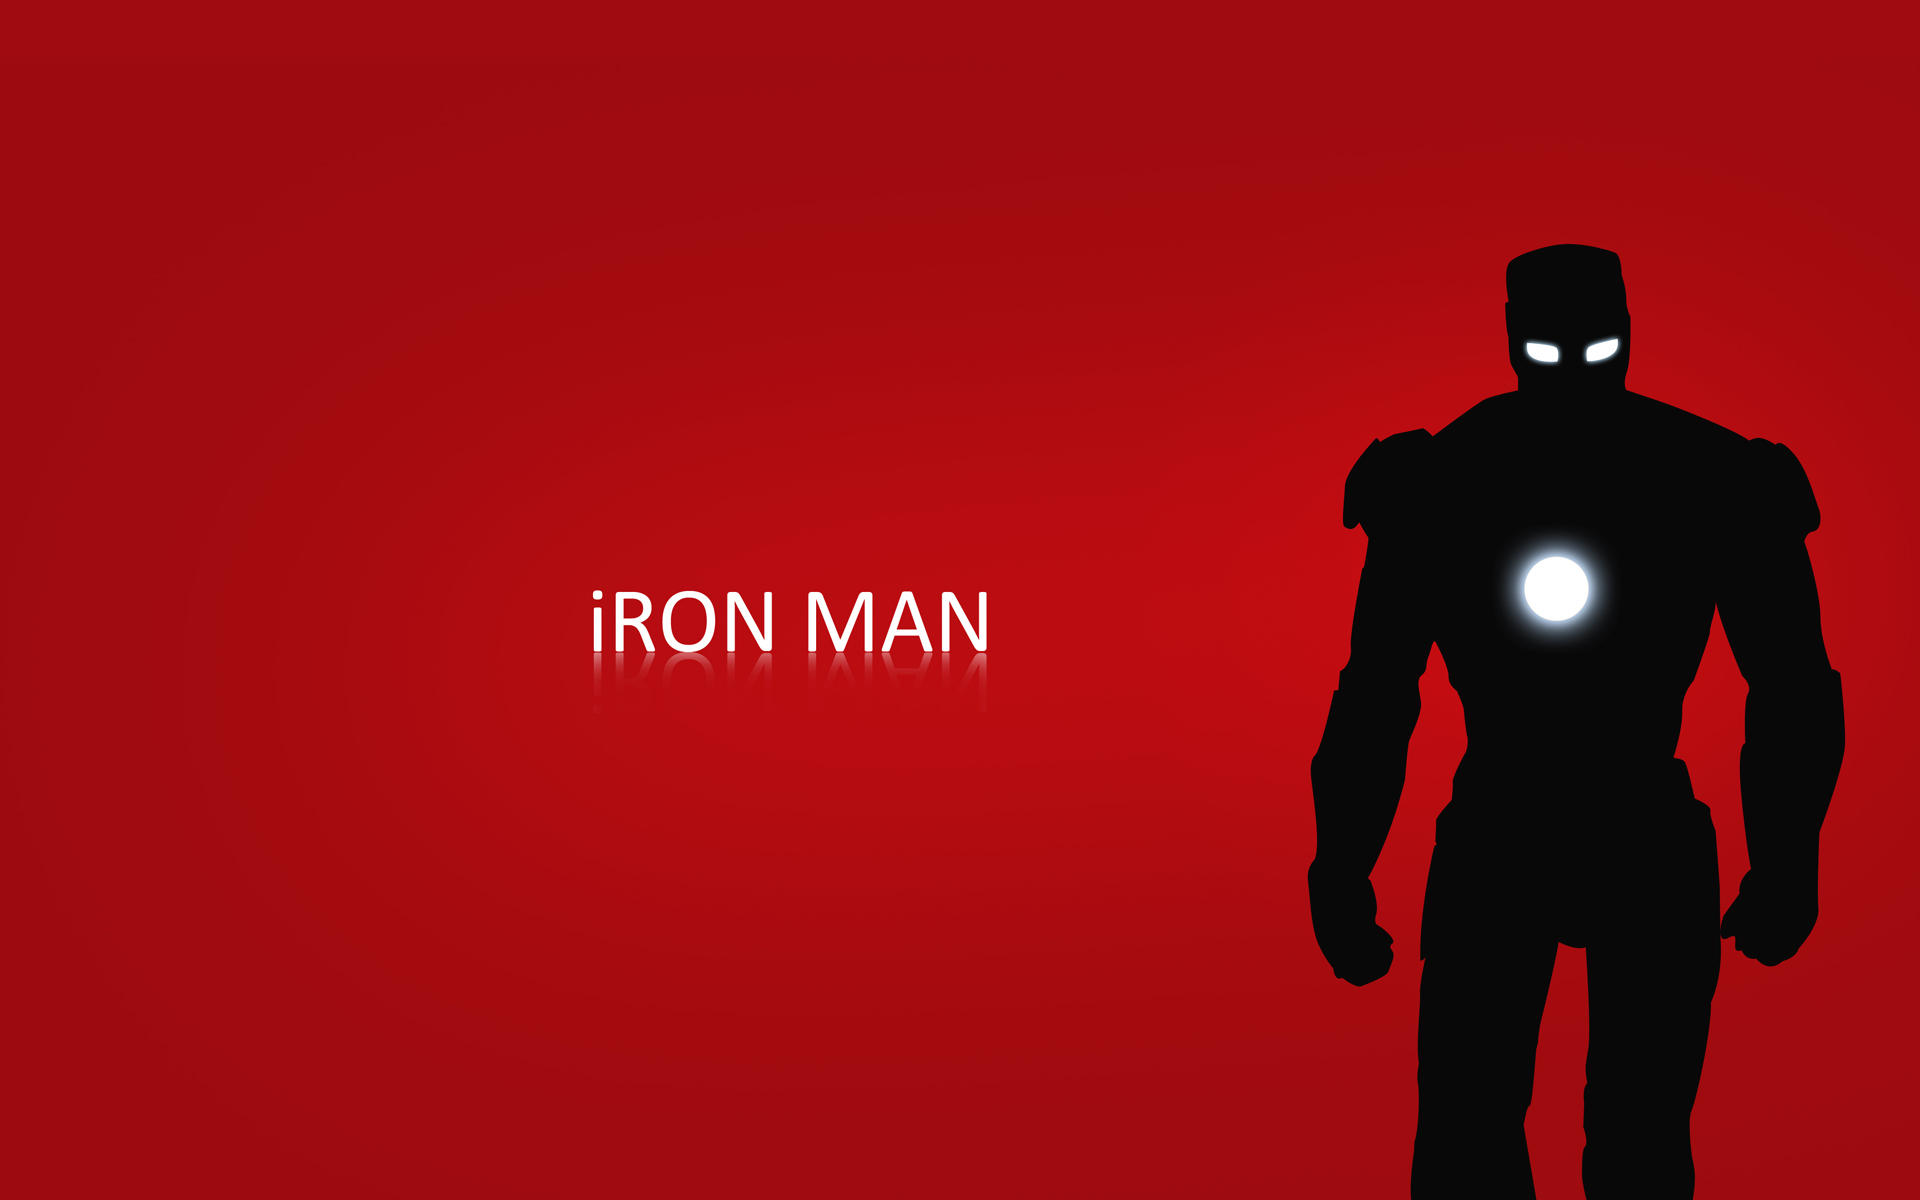 iRON MAN by TheSaladMan